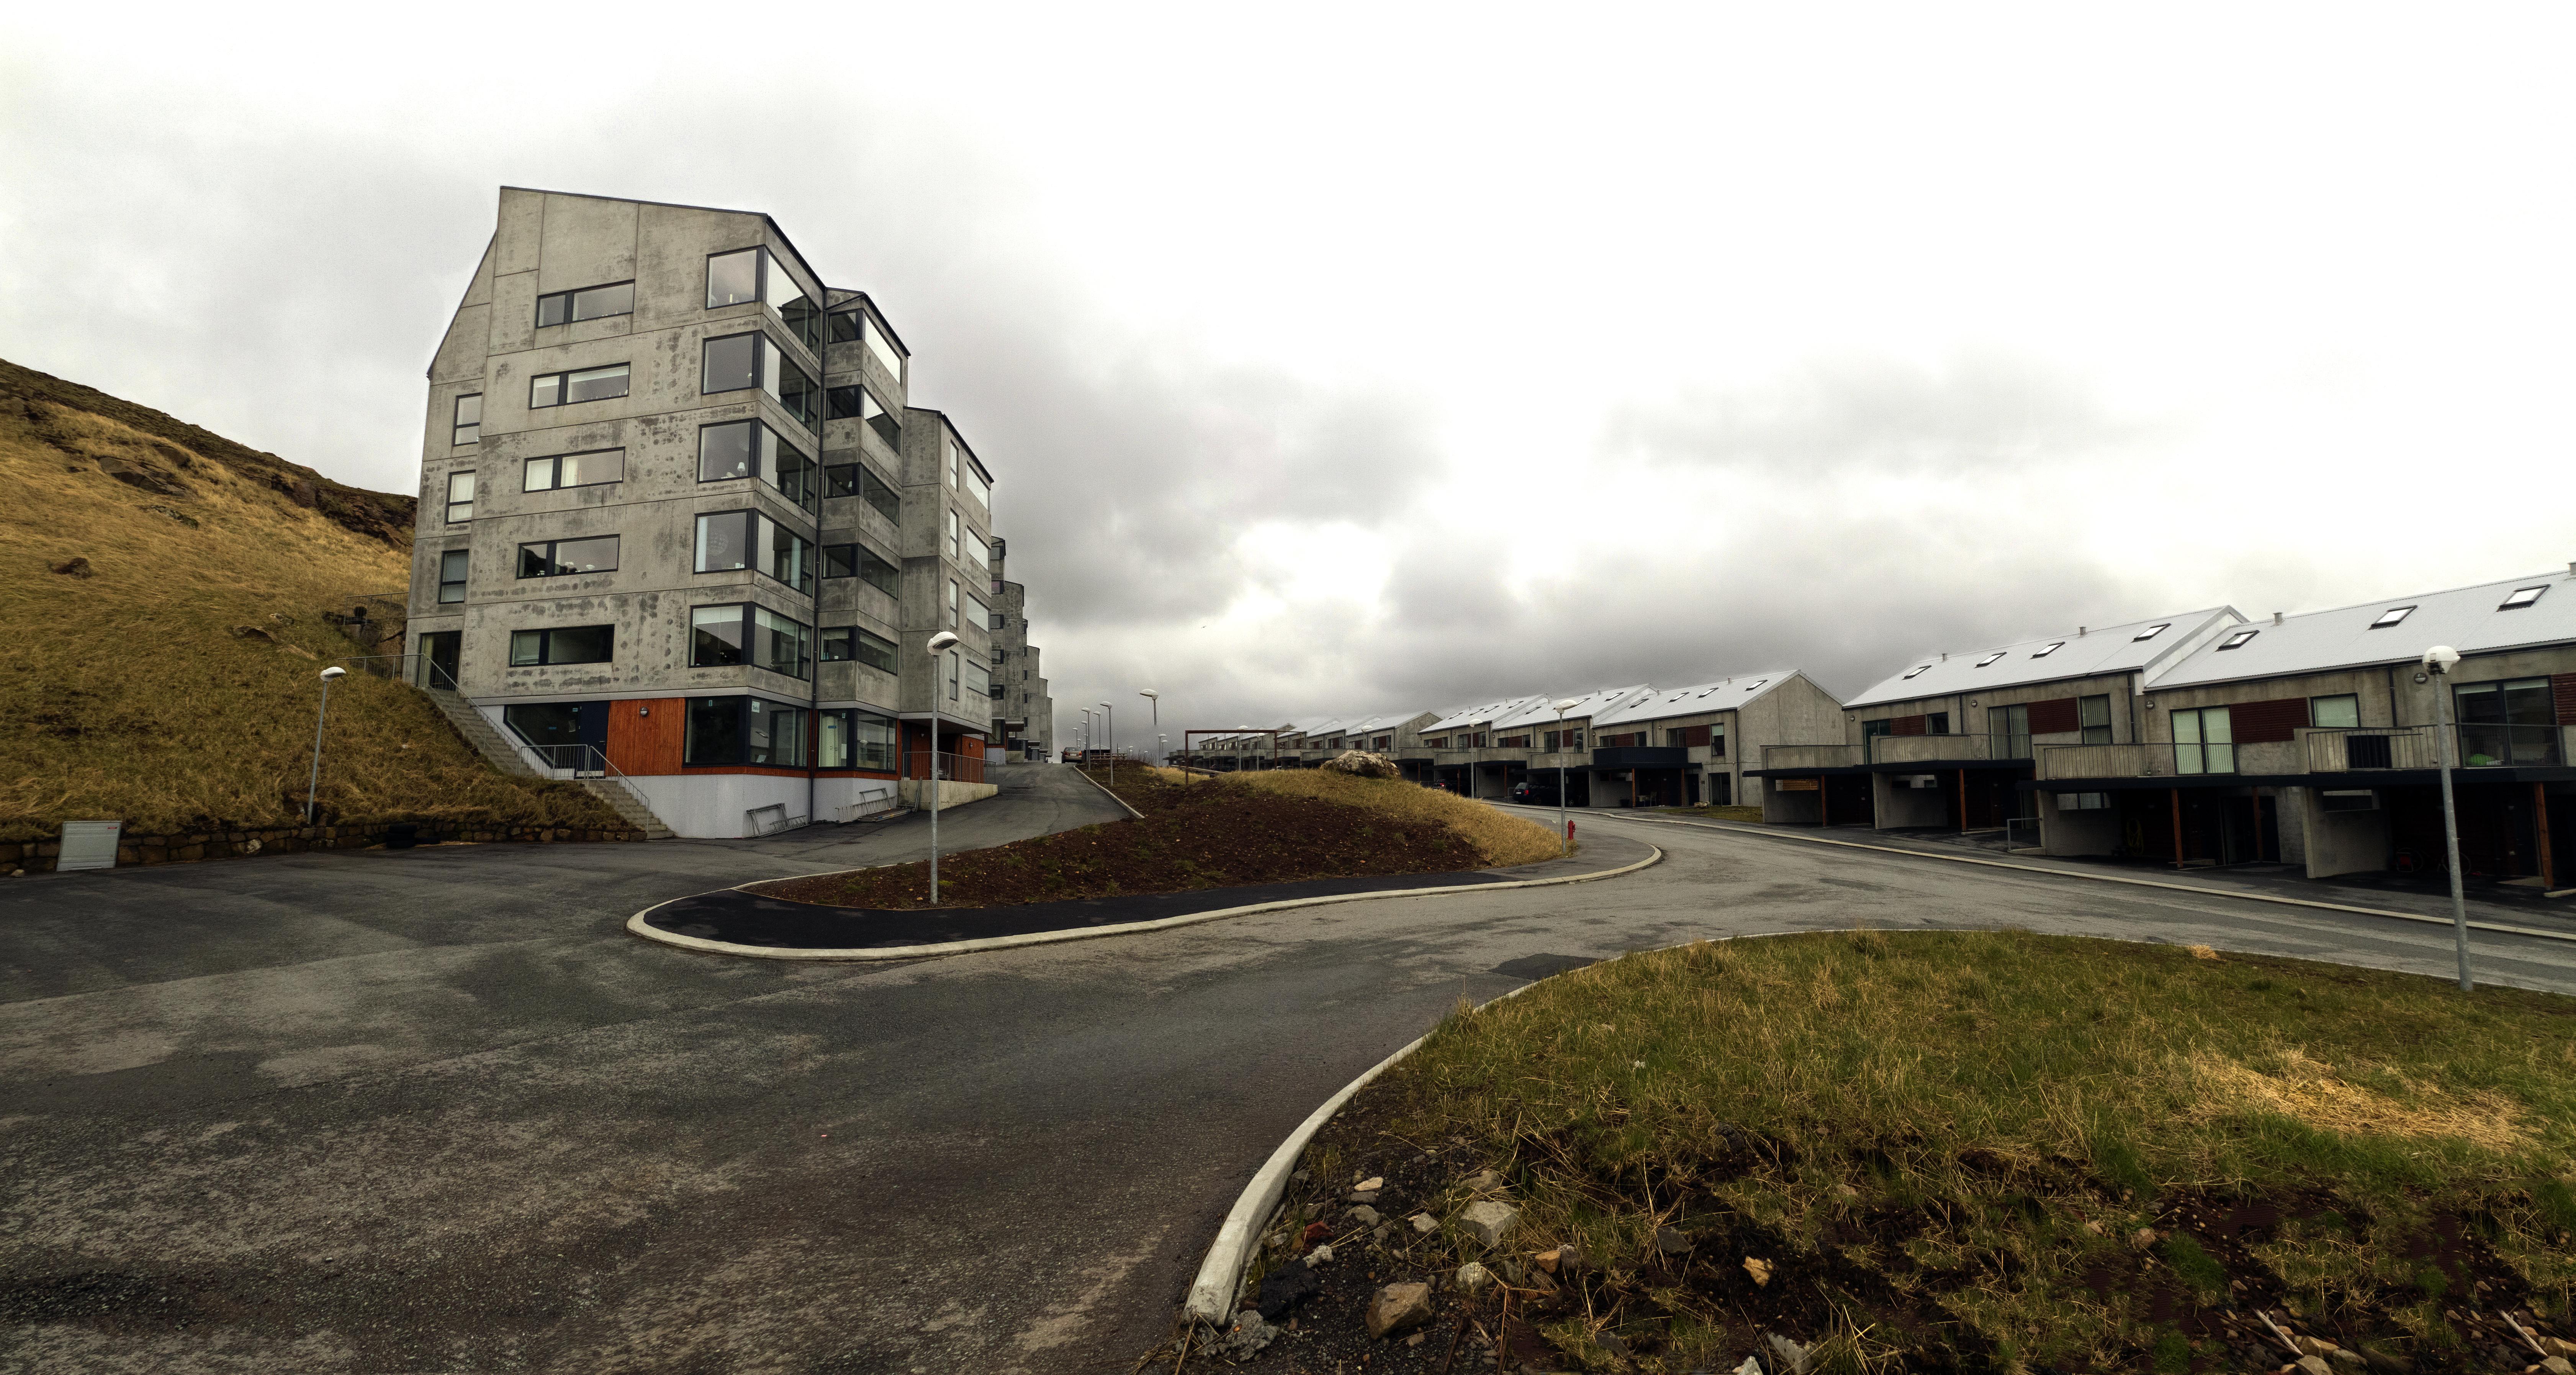 _MG_0928.Panorama